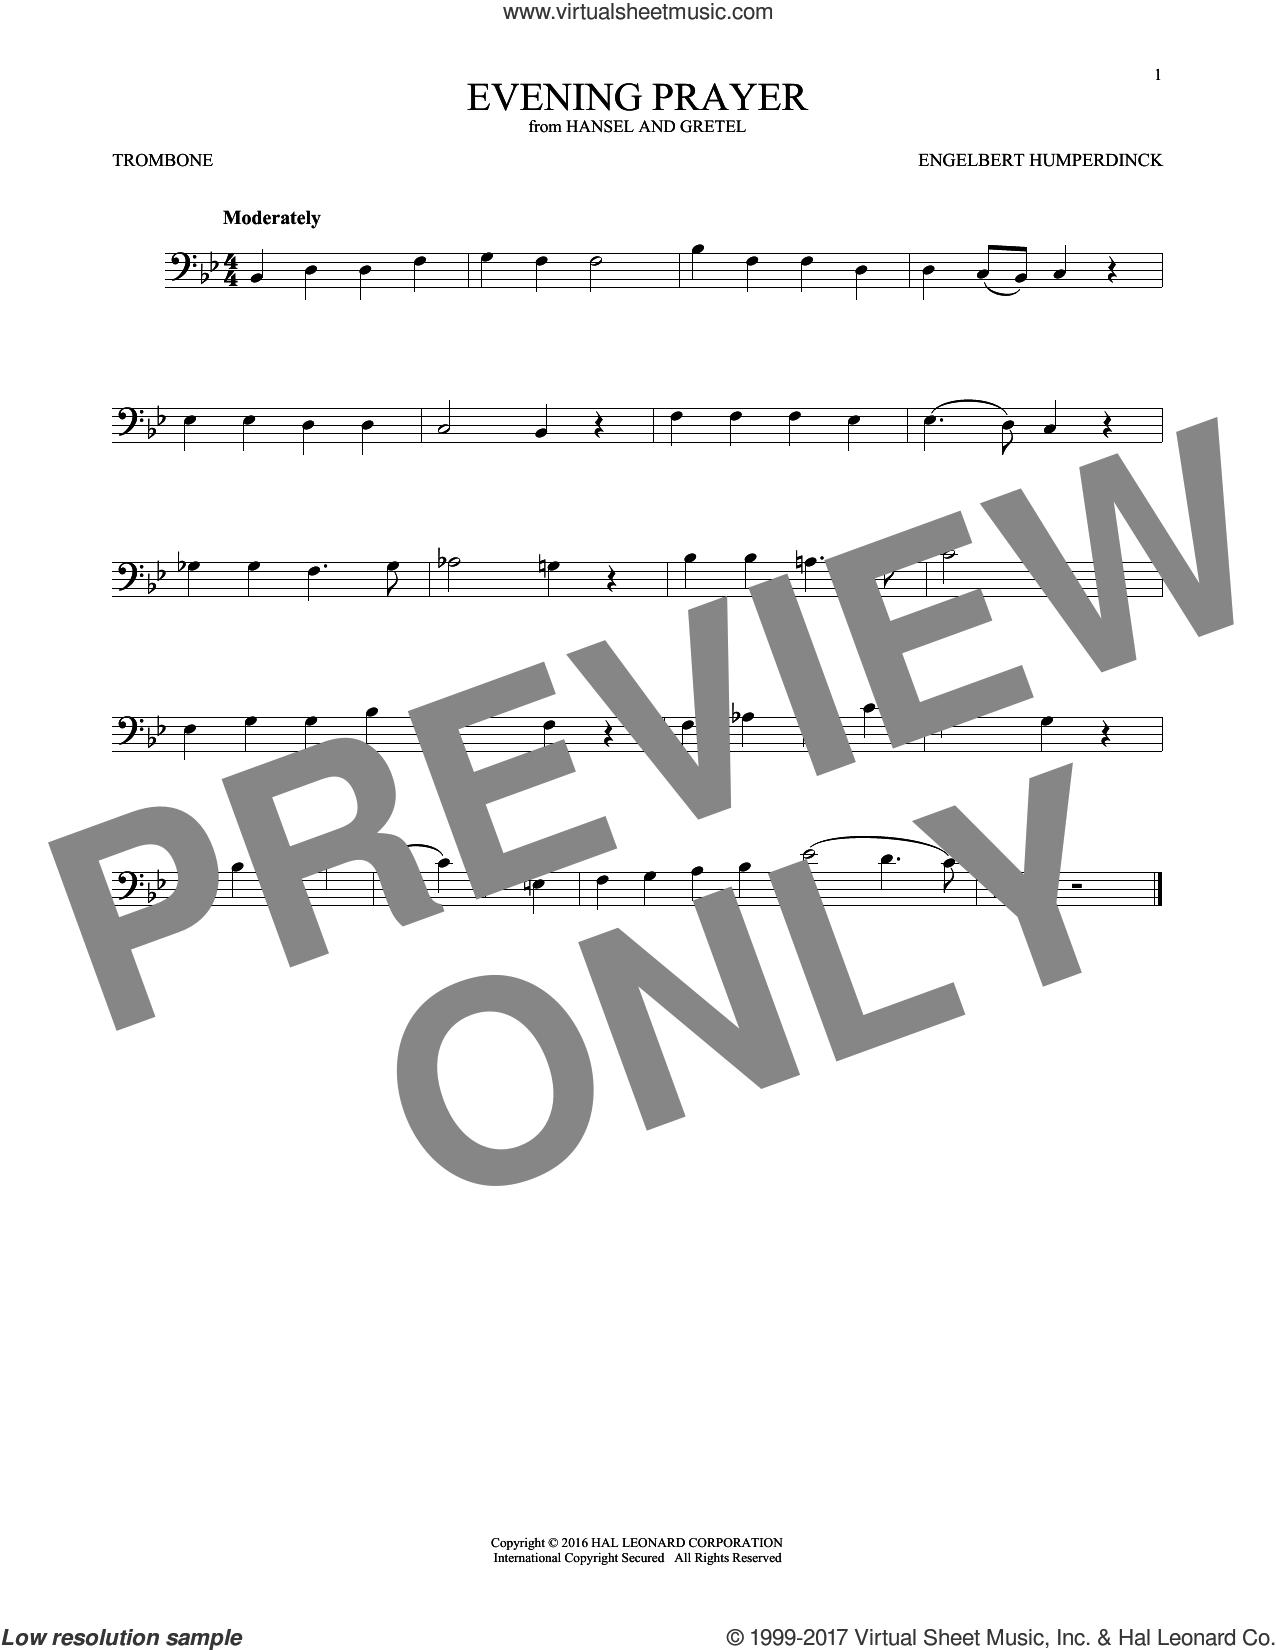 Evening Prayer sheet music for trombone solo by Engelbert Humperdinck, intermediate skill level